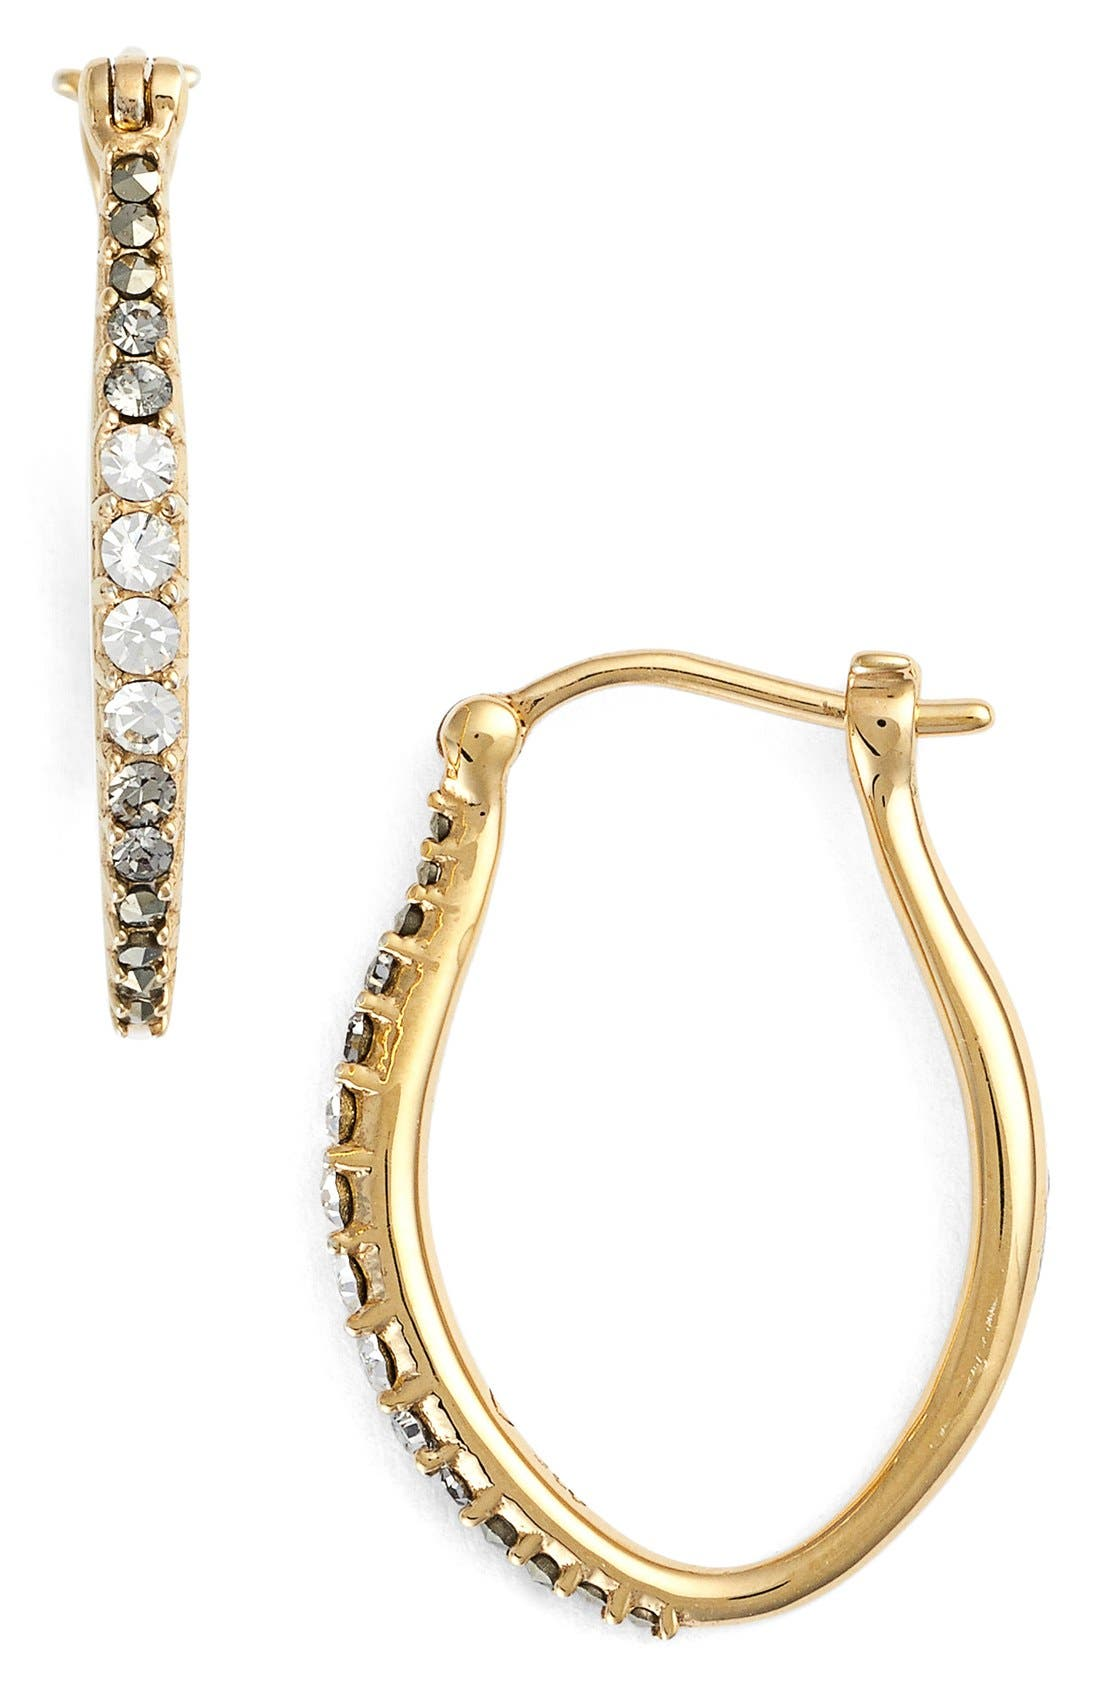 Marcasite & Swarovski Crystal Hoop Earrings,                             Main thumbnail 1, color,                             Gold